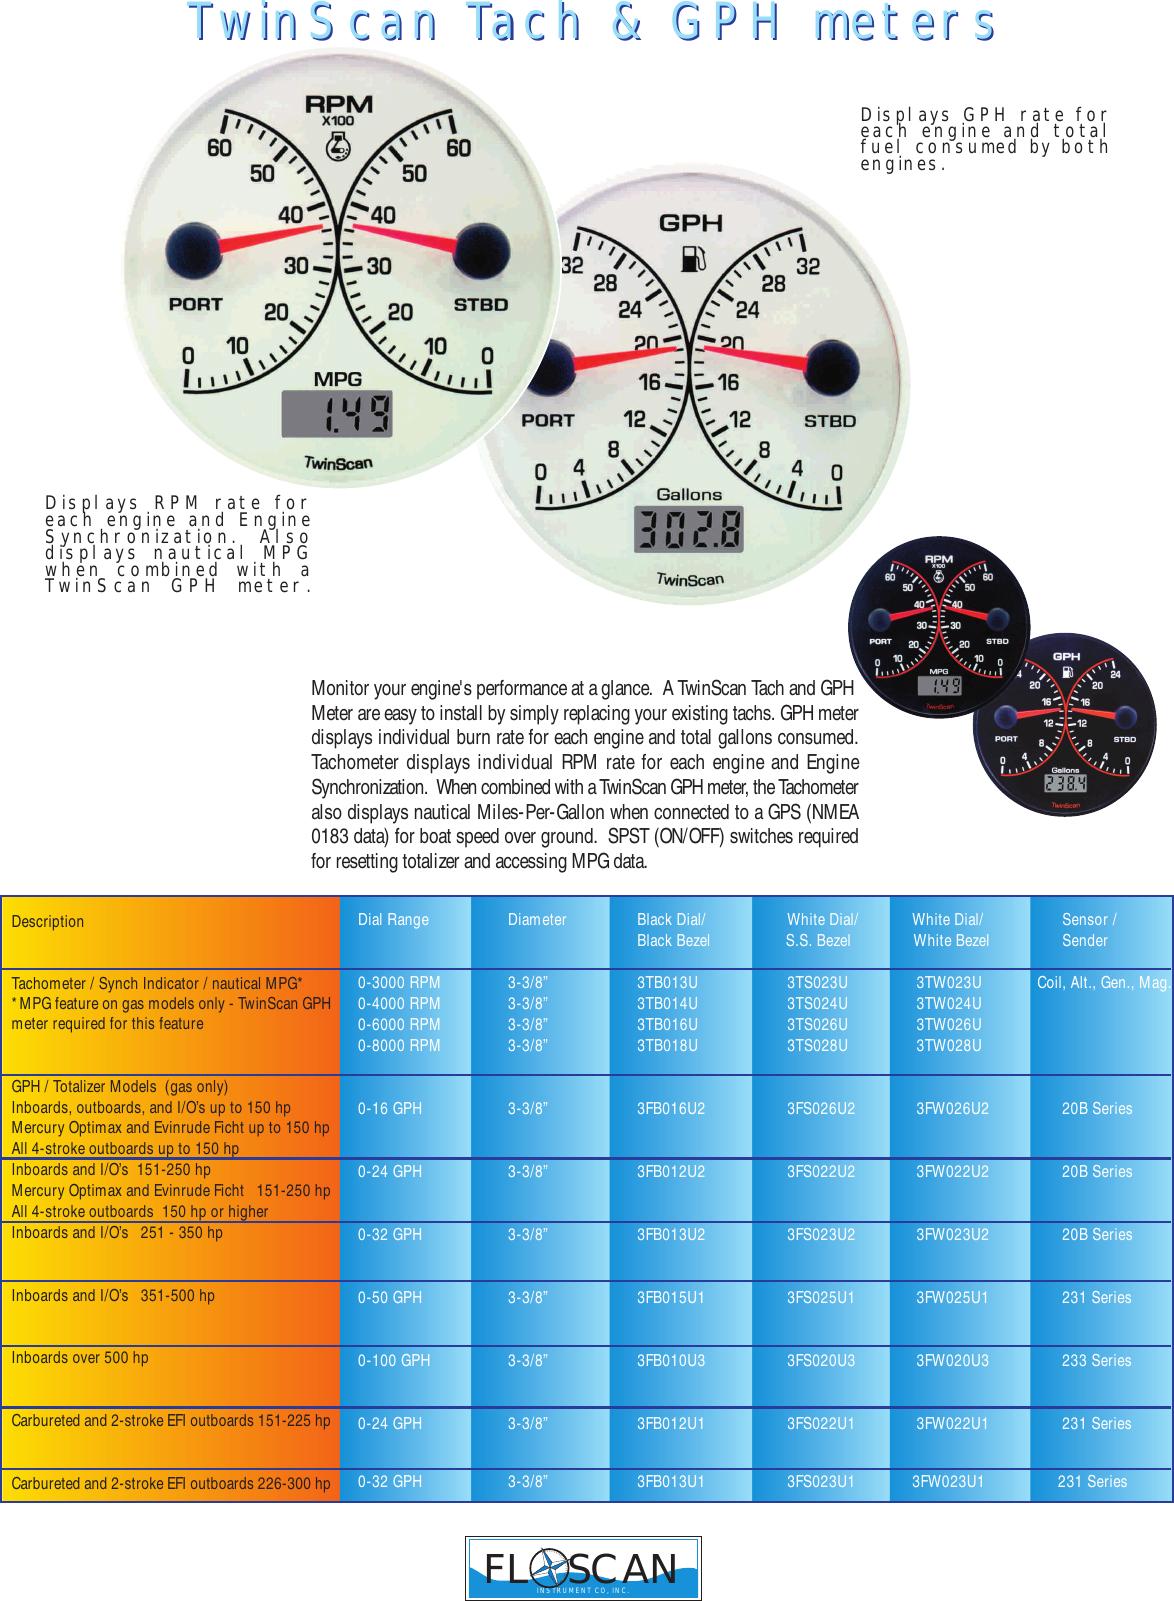 Floscan Instrument Single Engine Fuel Meter 5510 20B 1 Users Manual